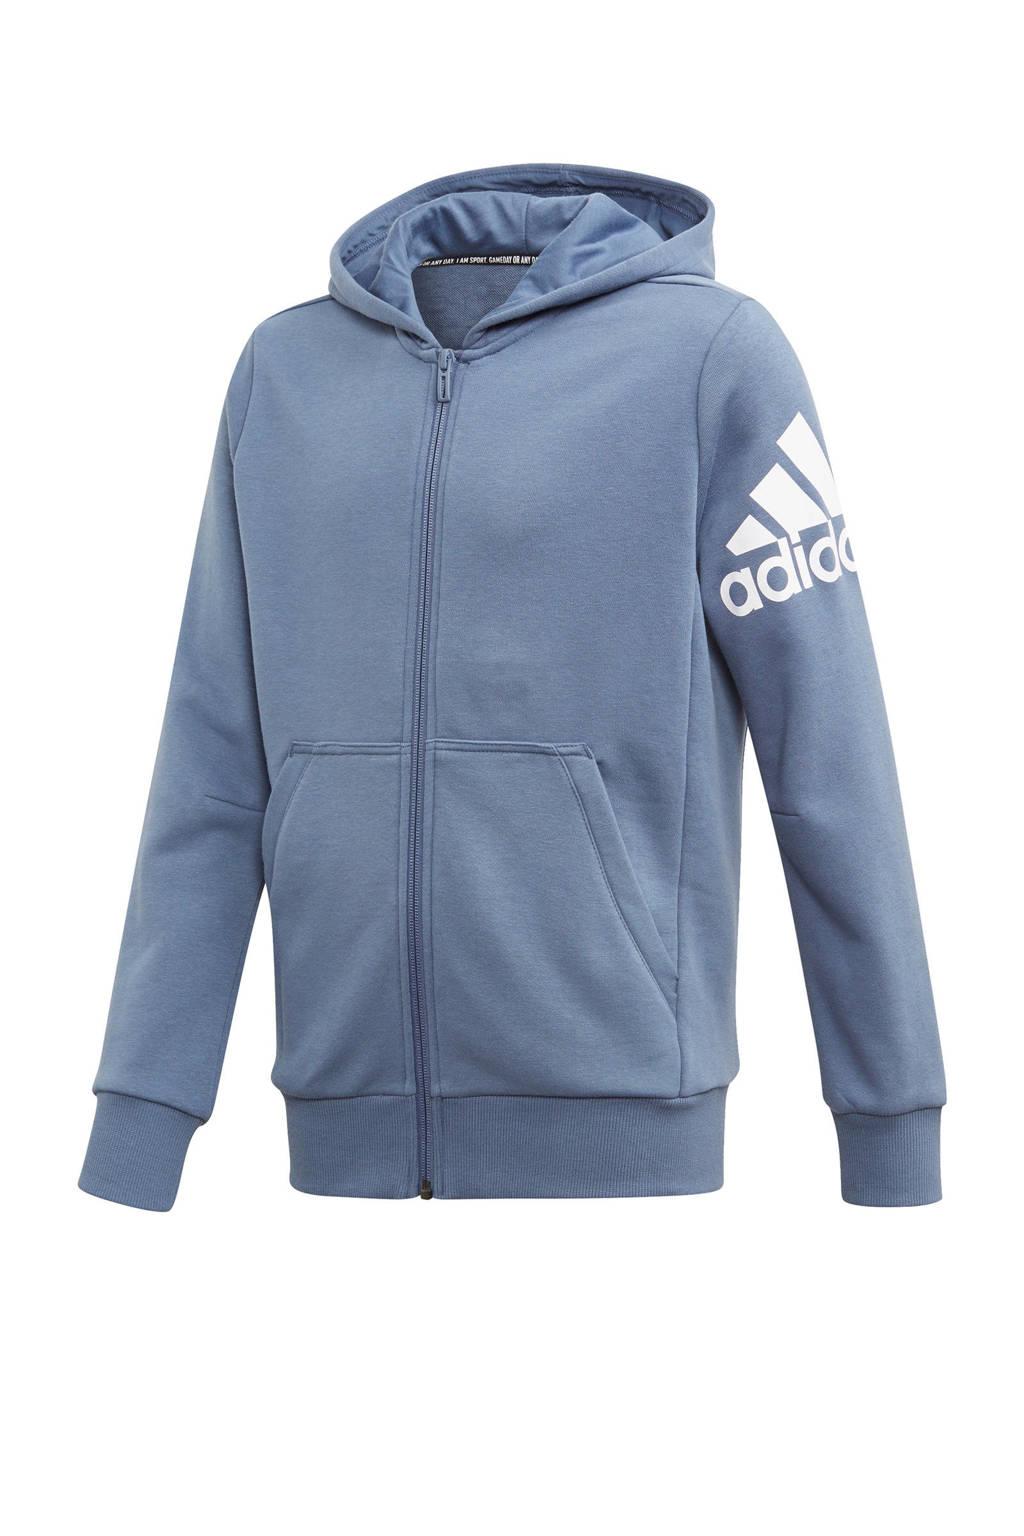 adidas performance   sportvest grijsblauw, Grijsblauw